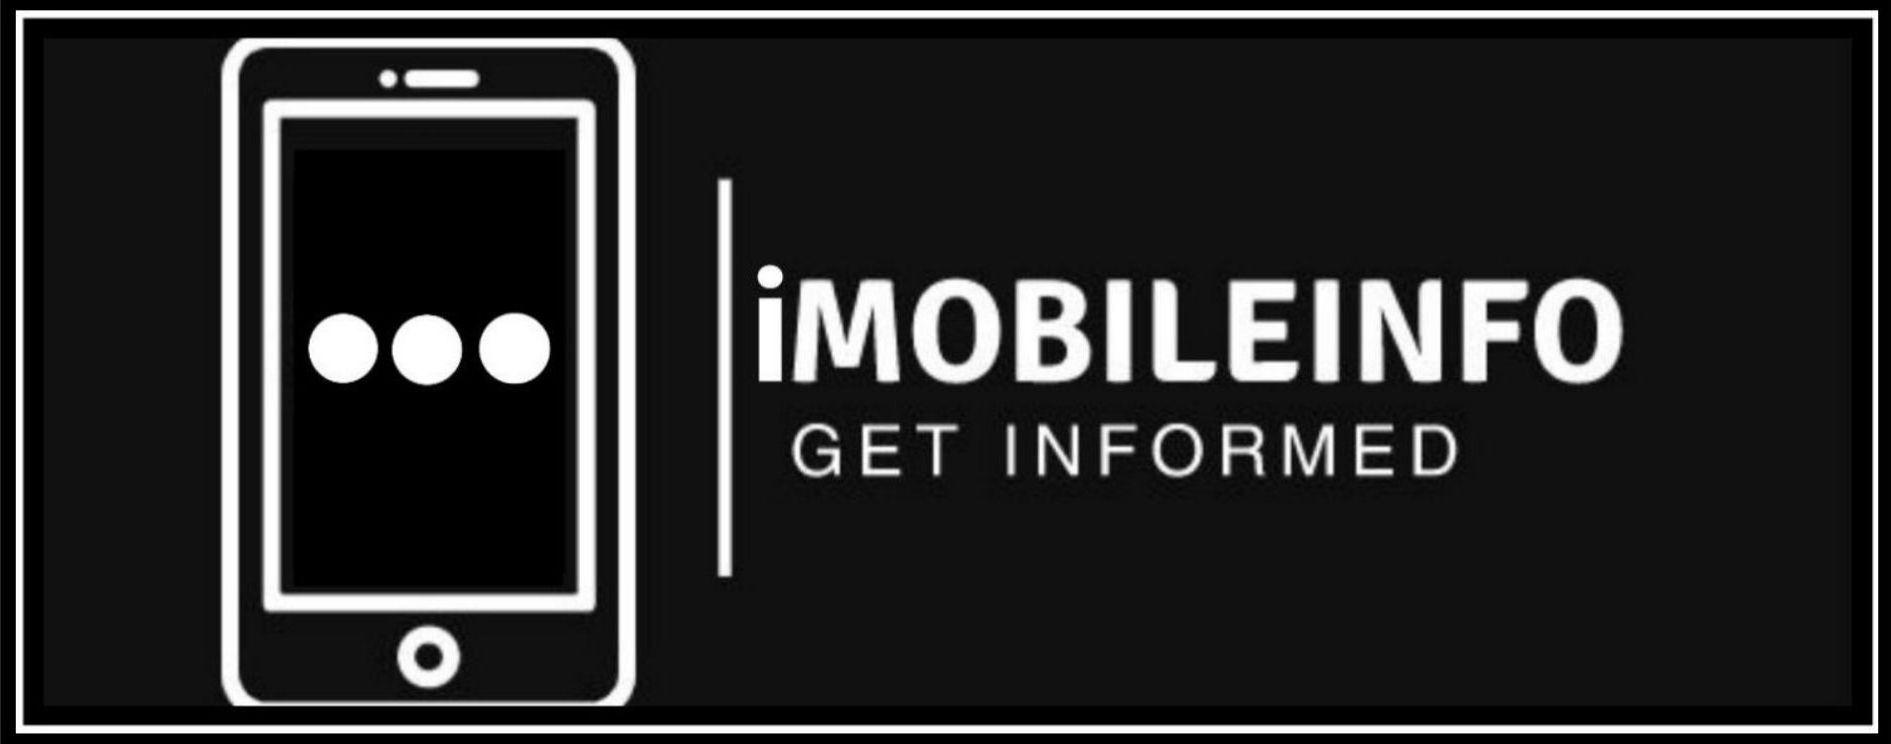 iMobileinfo